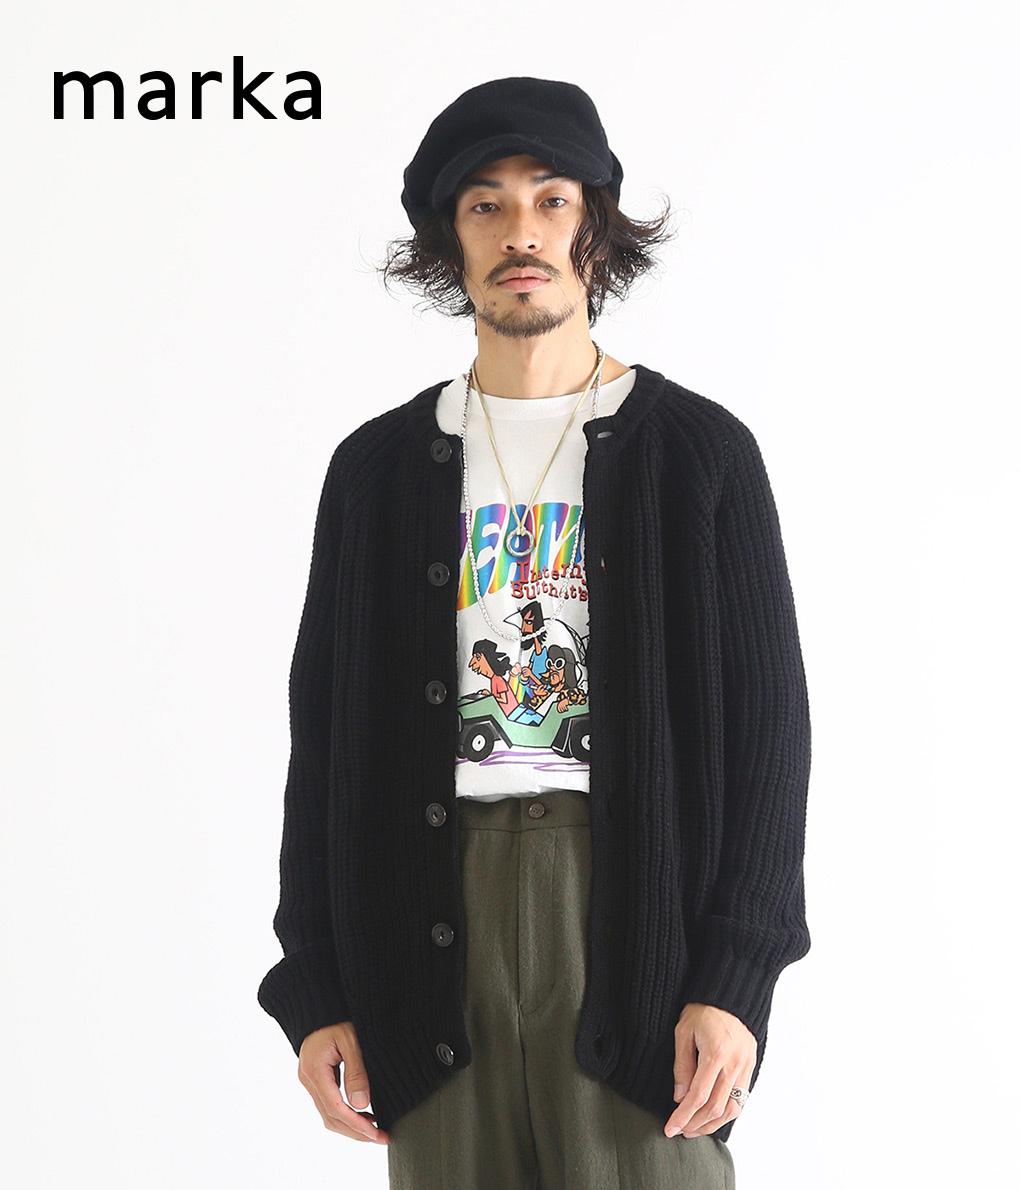 marka / マーカ : 別注 CREW-NECK CARDIGAN - ARKnets & PARKING exclusive - : マーカ クルーネックニット カーディガン カーディガン クルーネック 別注 メンズ : M18C-09SW01C 【WIS】【COR】